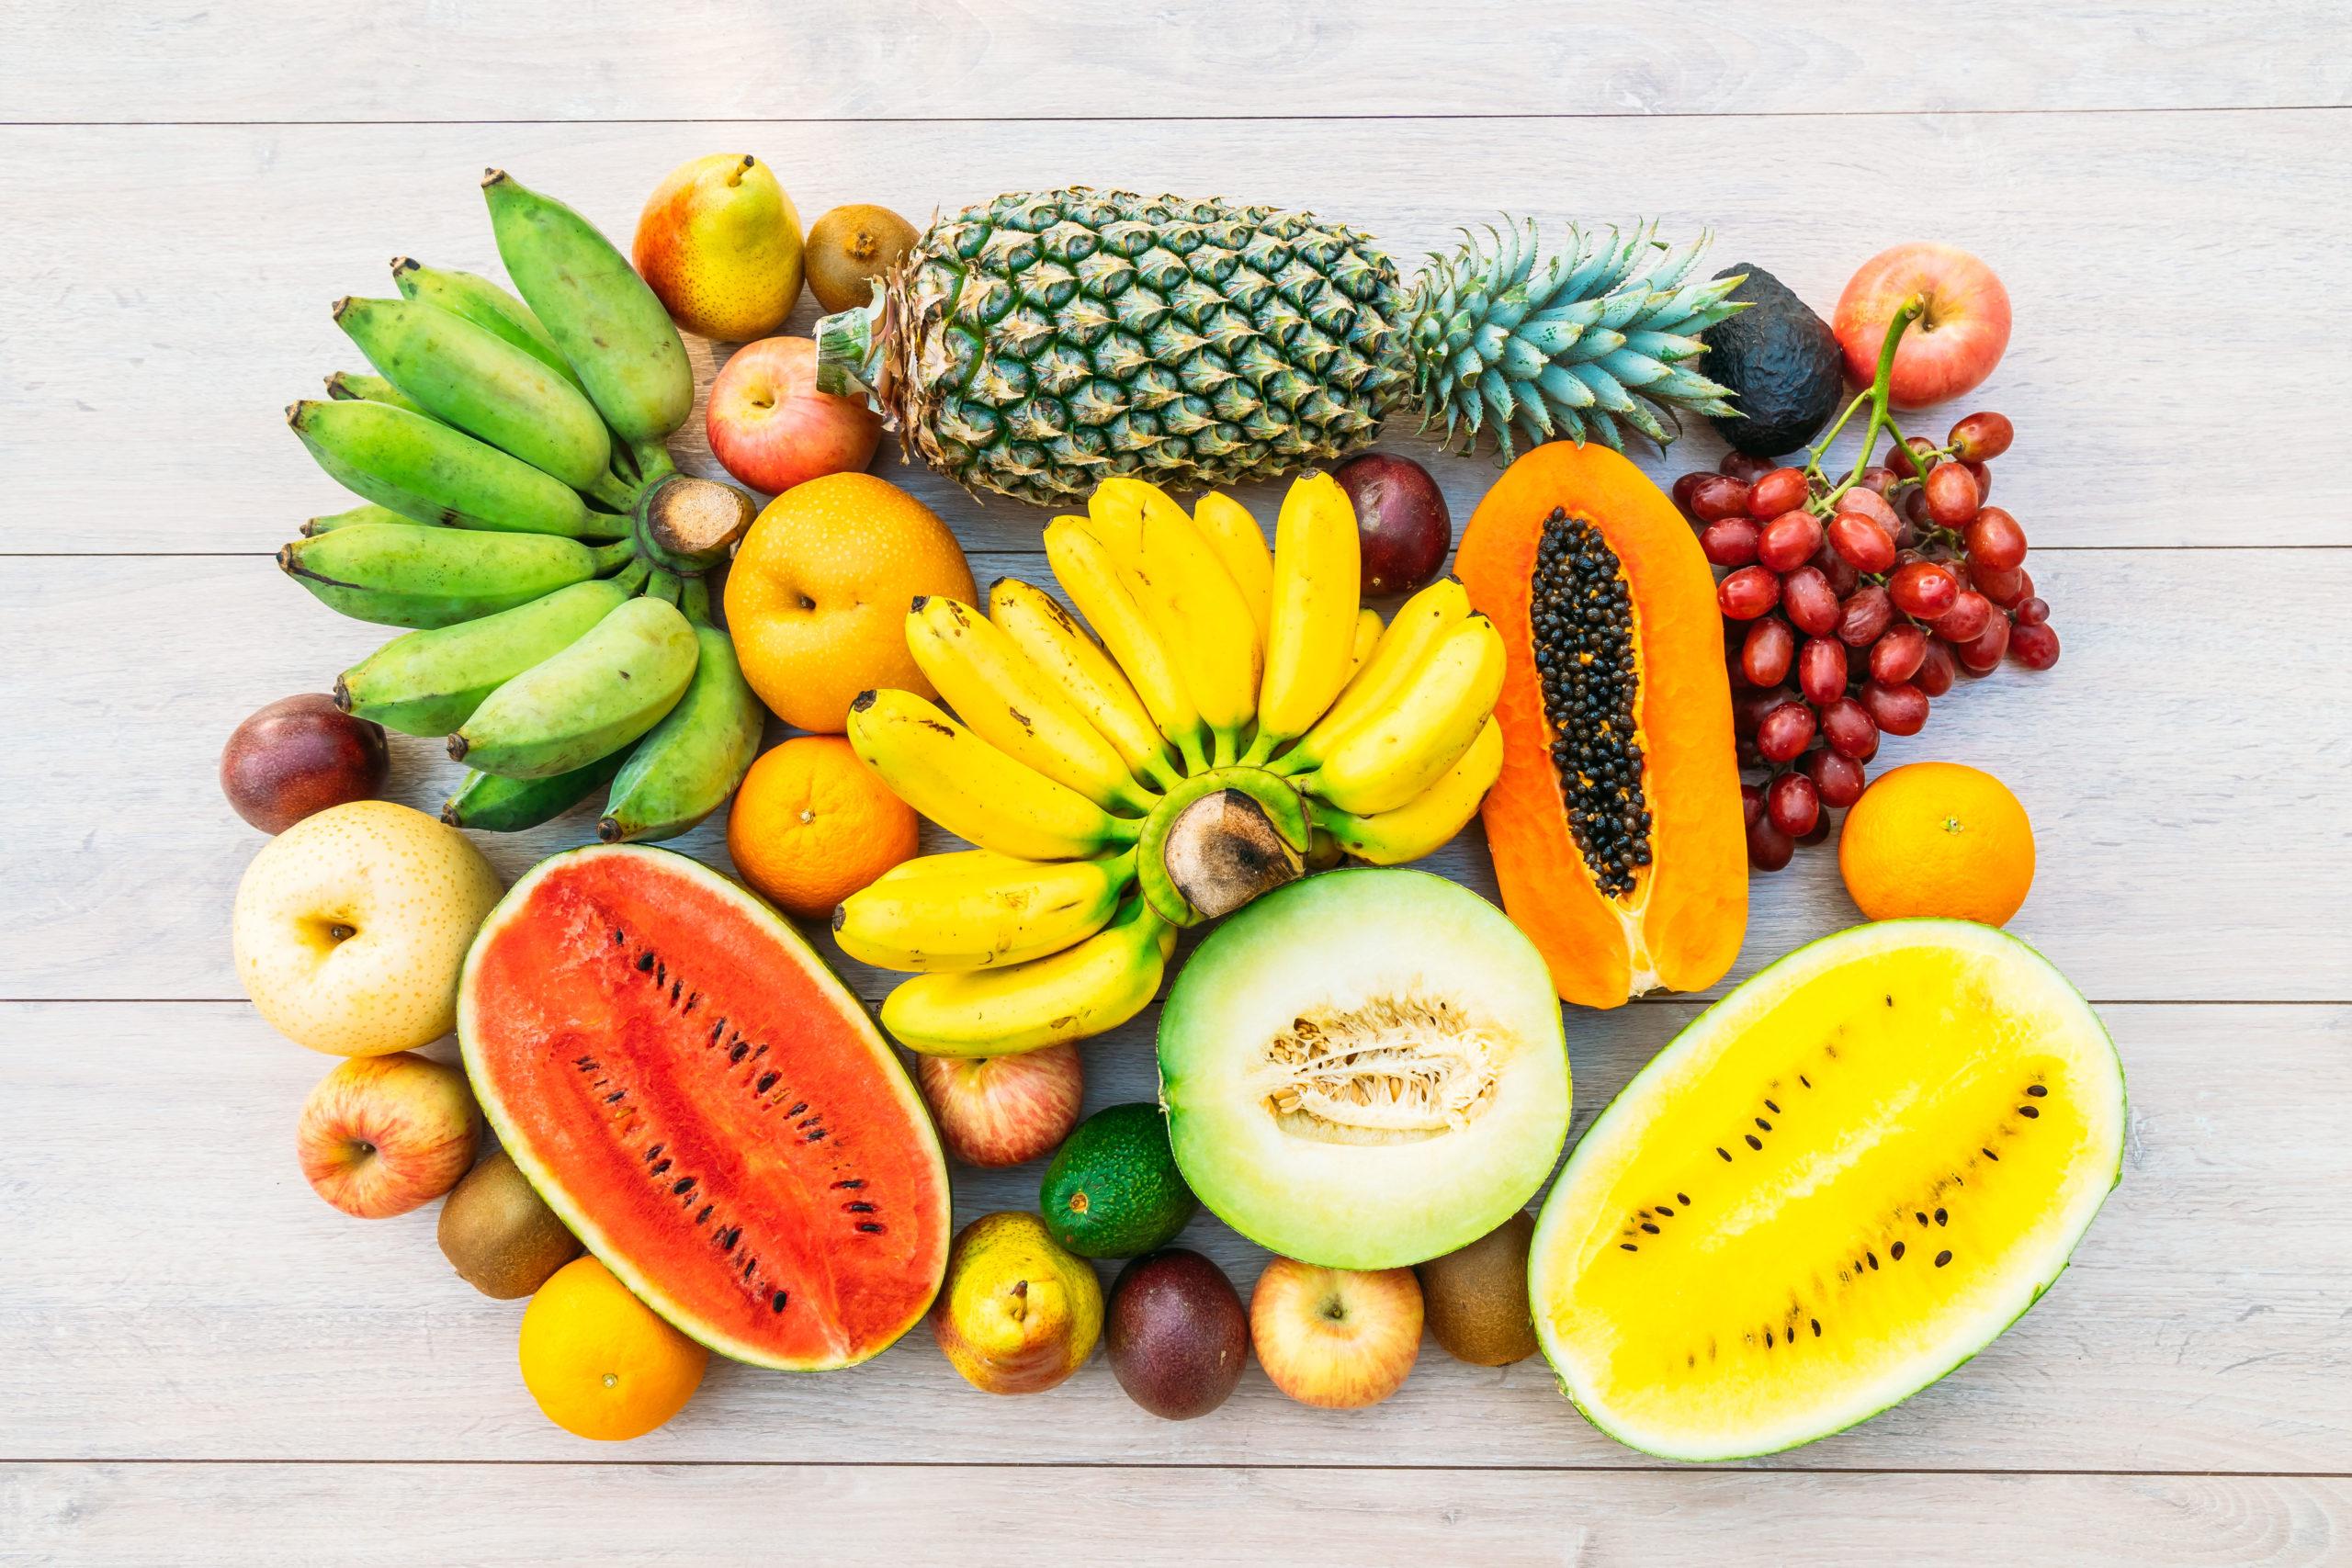 Perbanyak-Sayur-dan-Buah-menurunkan-kolesterol